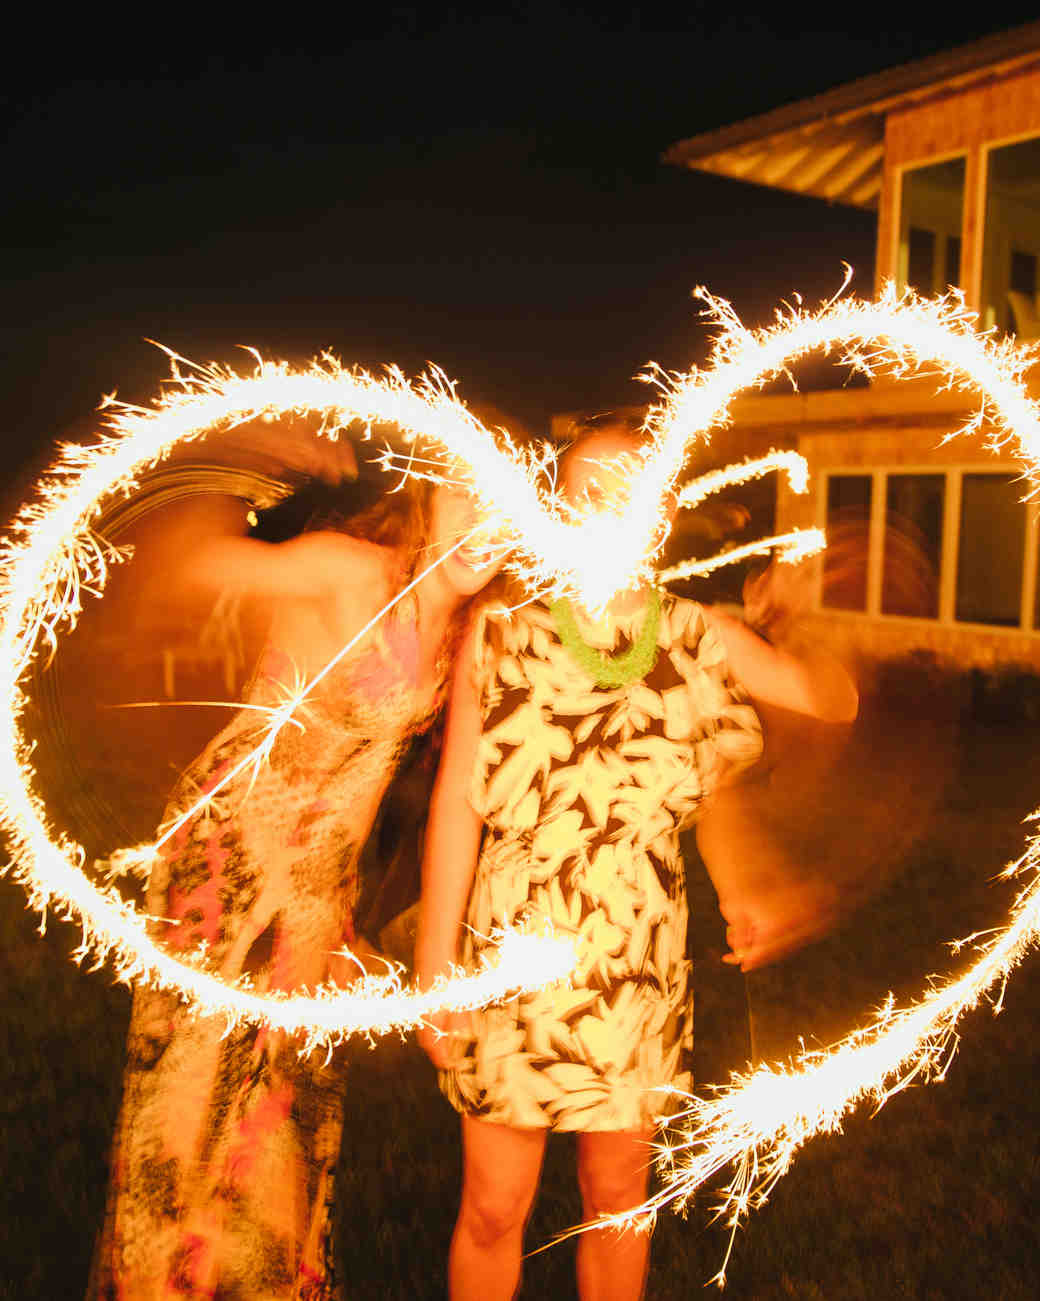 gabriela-tyson-wedding-sparklers-1155-s111708-1214.jpg